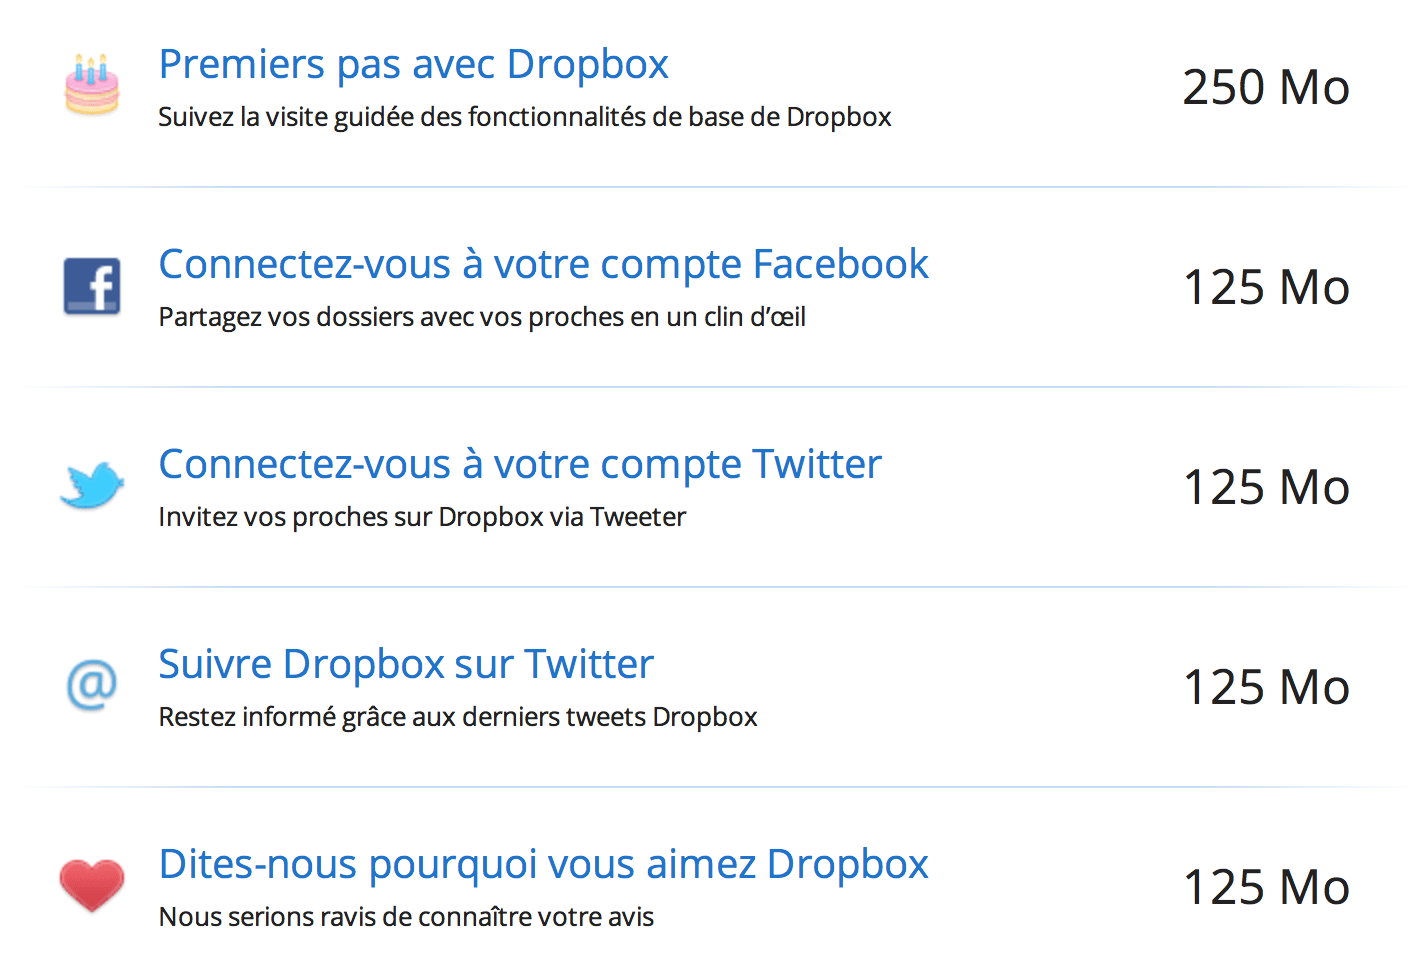 Get,Free,Space,Dropbox,Gagner,Espace,Dropbox